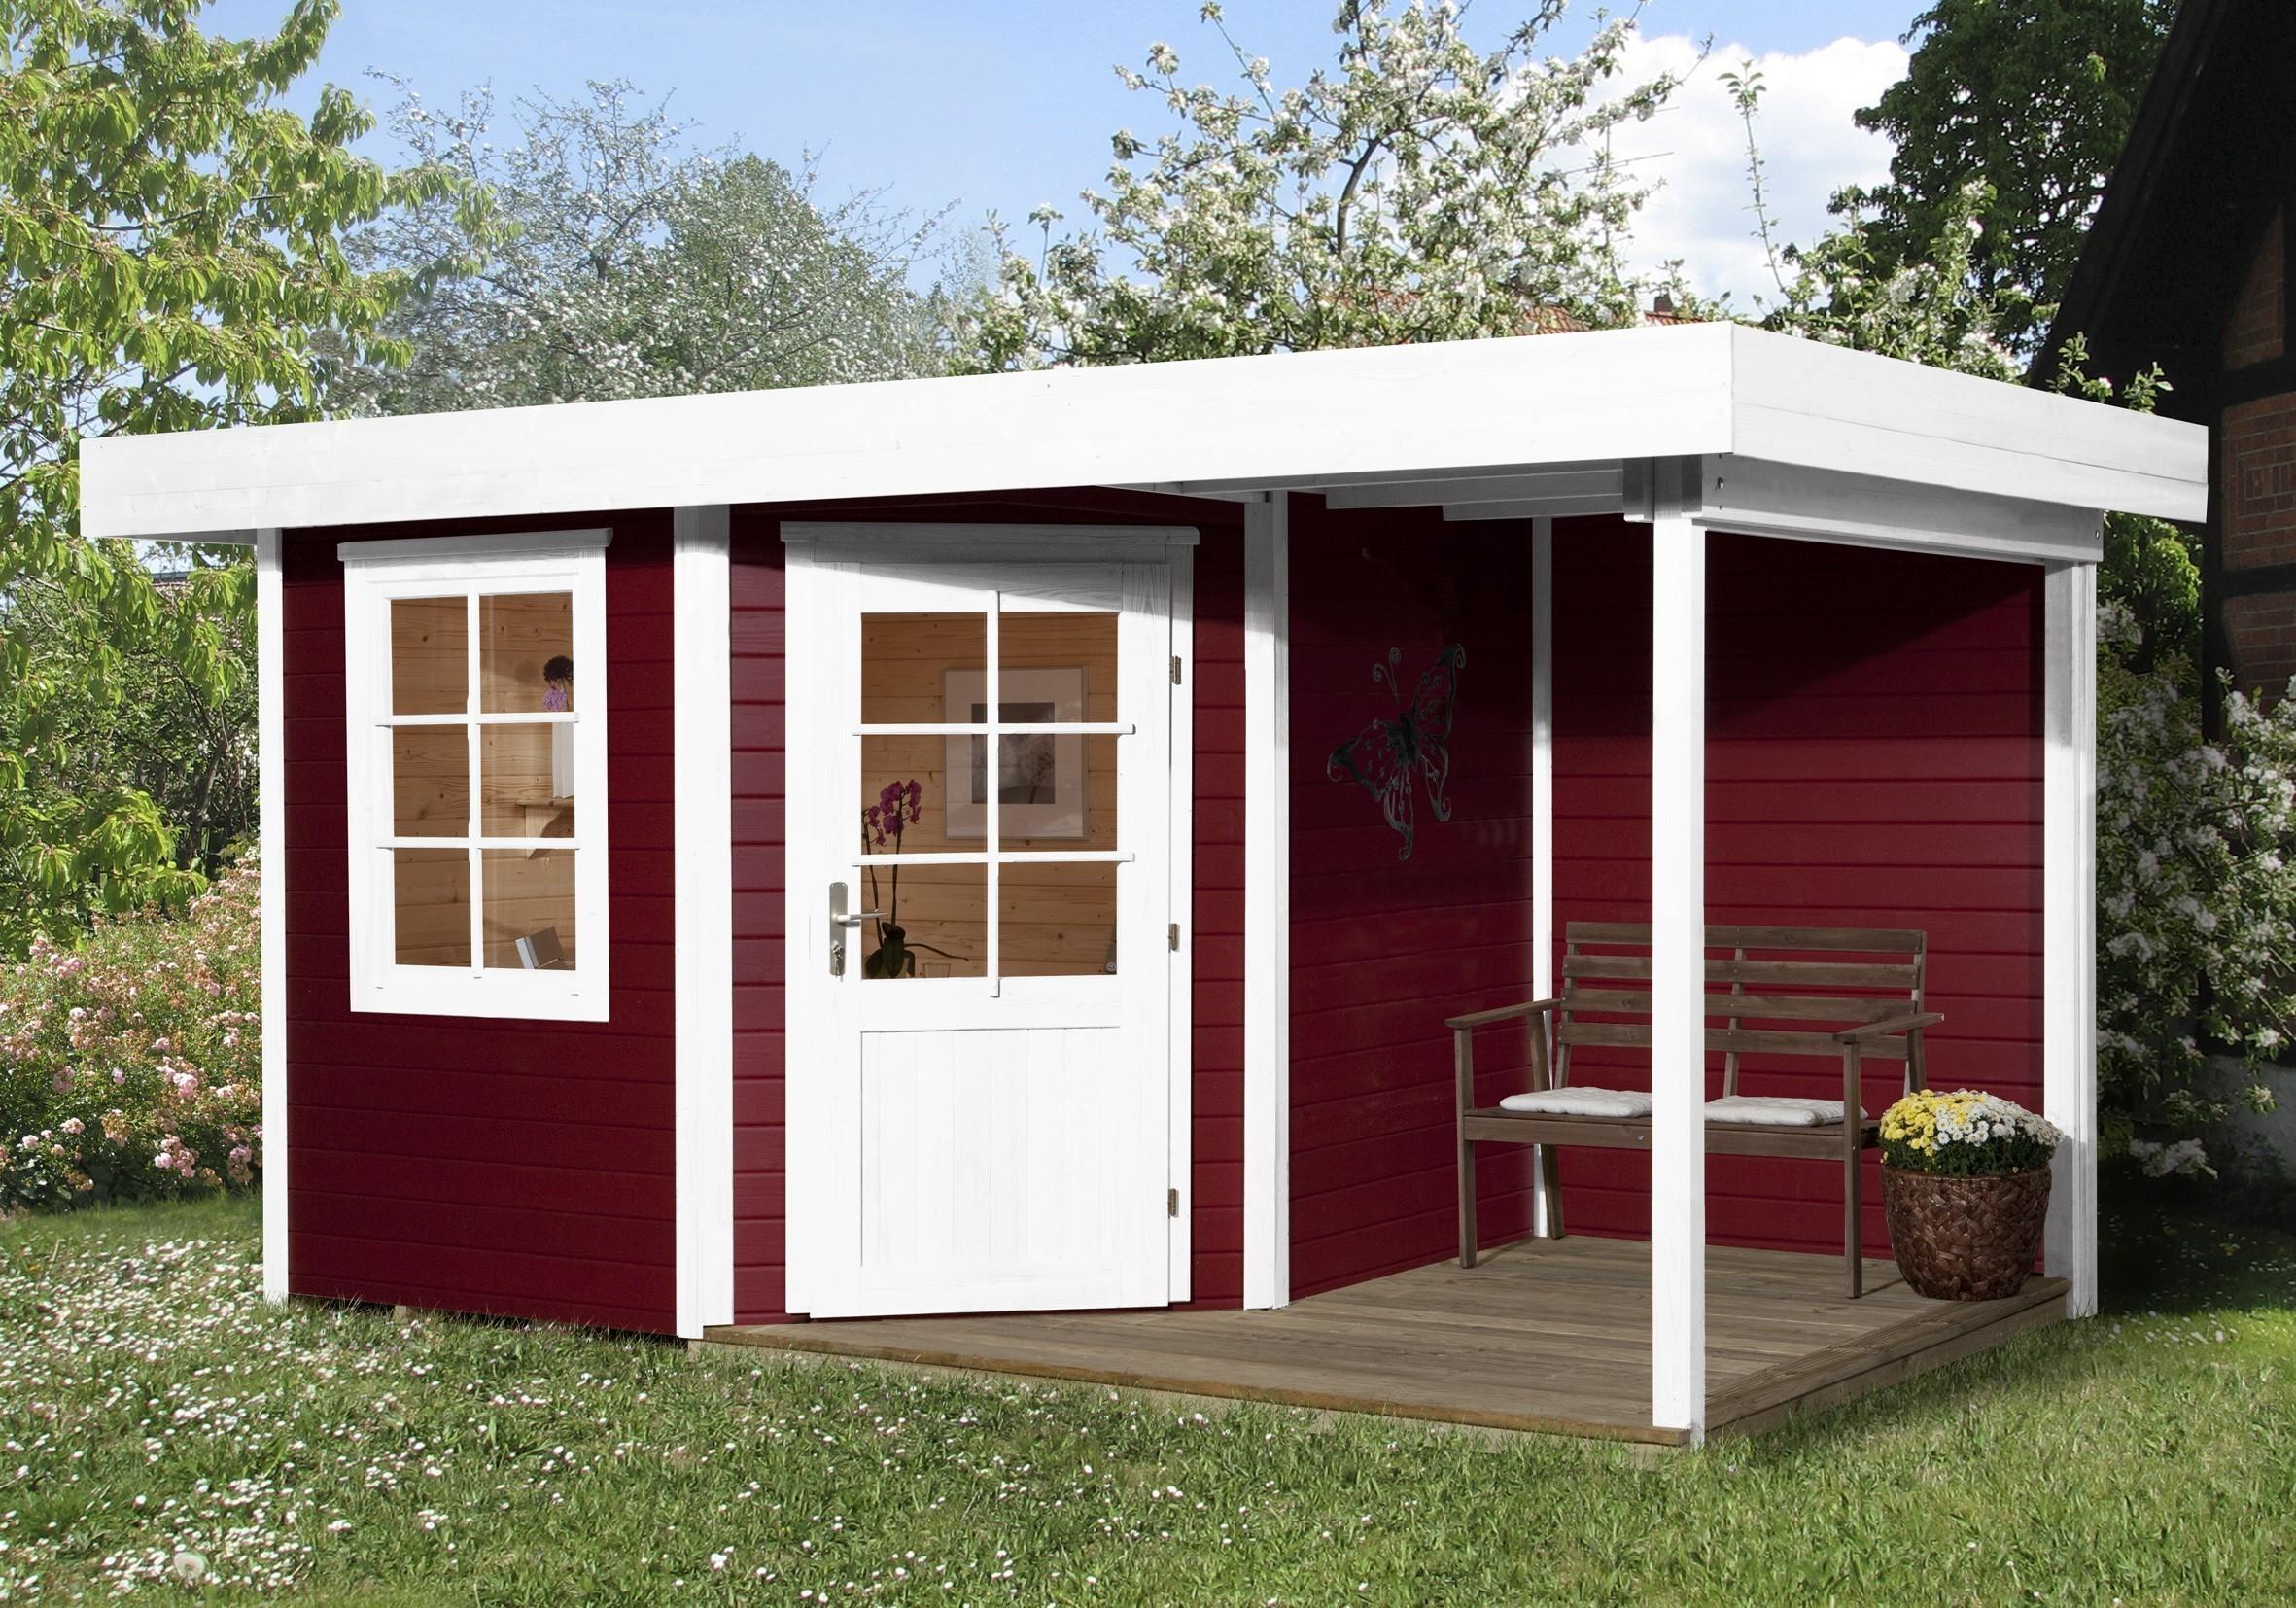 gartenhaus weka hinterzarten my blog. Black Bedroom Furniture Sets. Home Design Ideas